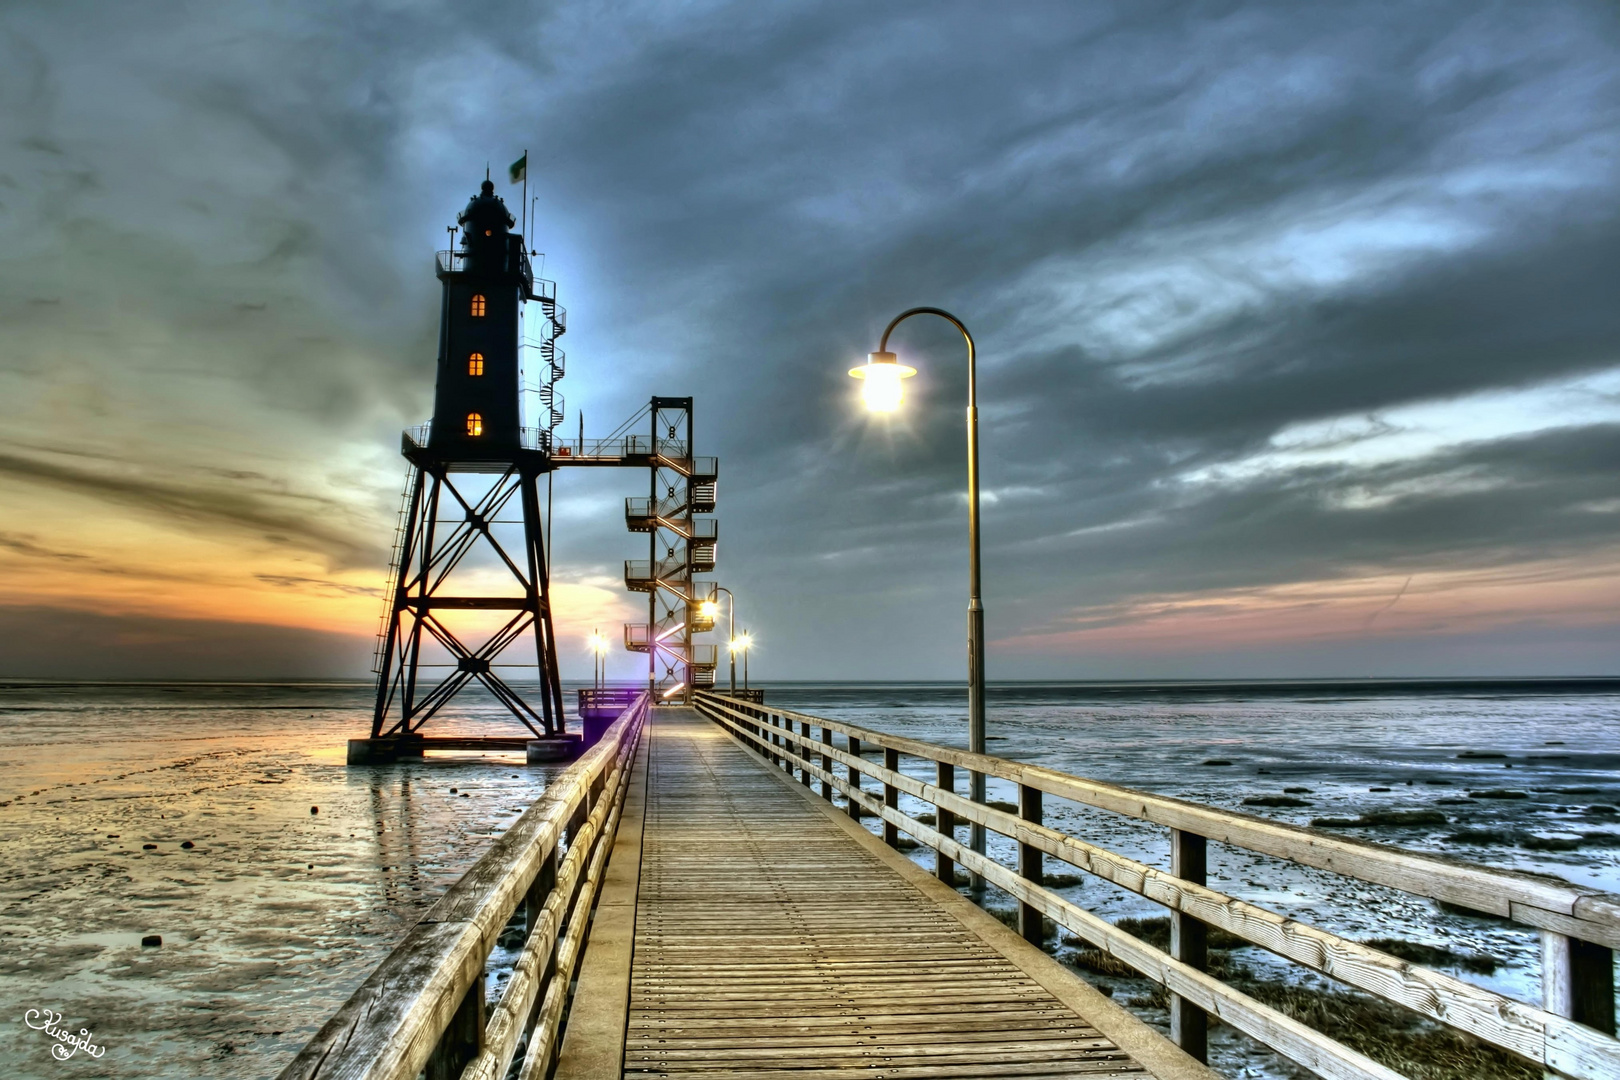 Dorumer Leuchtturm Obereversand - HDR